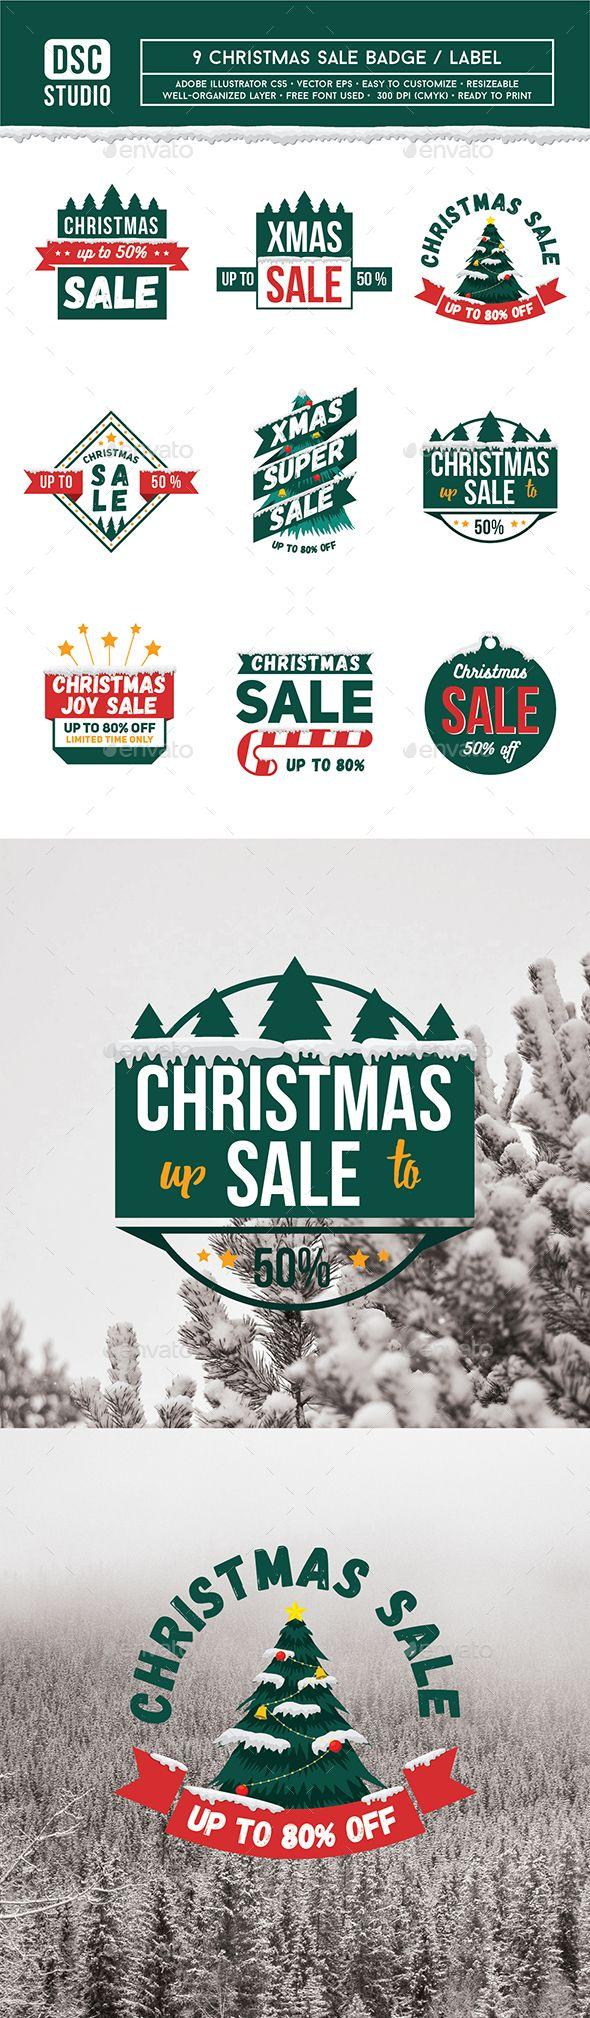 9 Christmas Sale Badge / Label | Ai illustrator, Label templates and ...